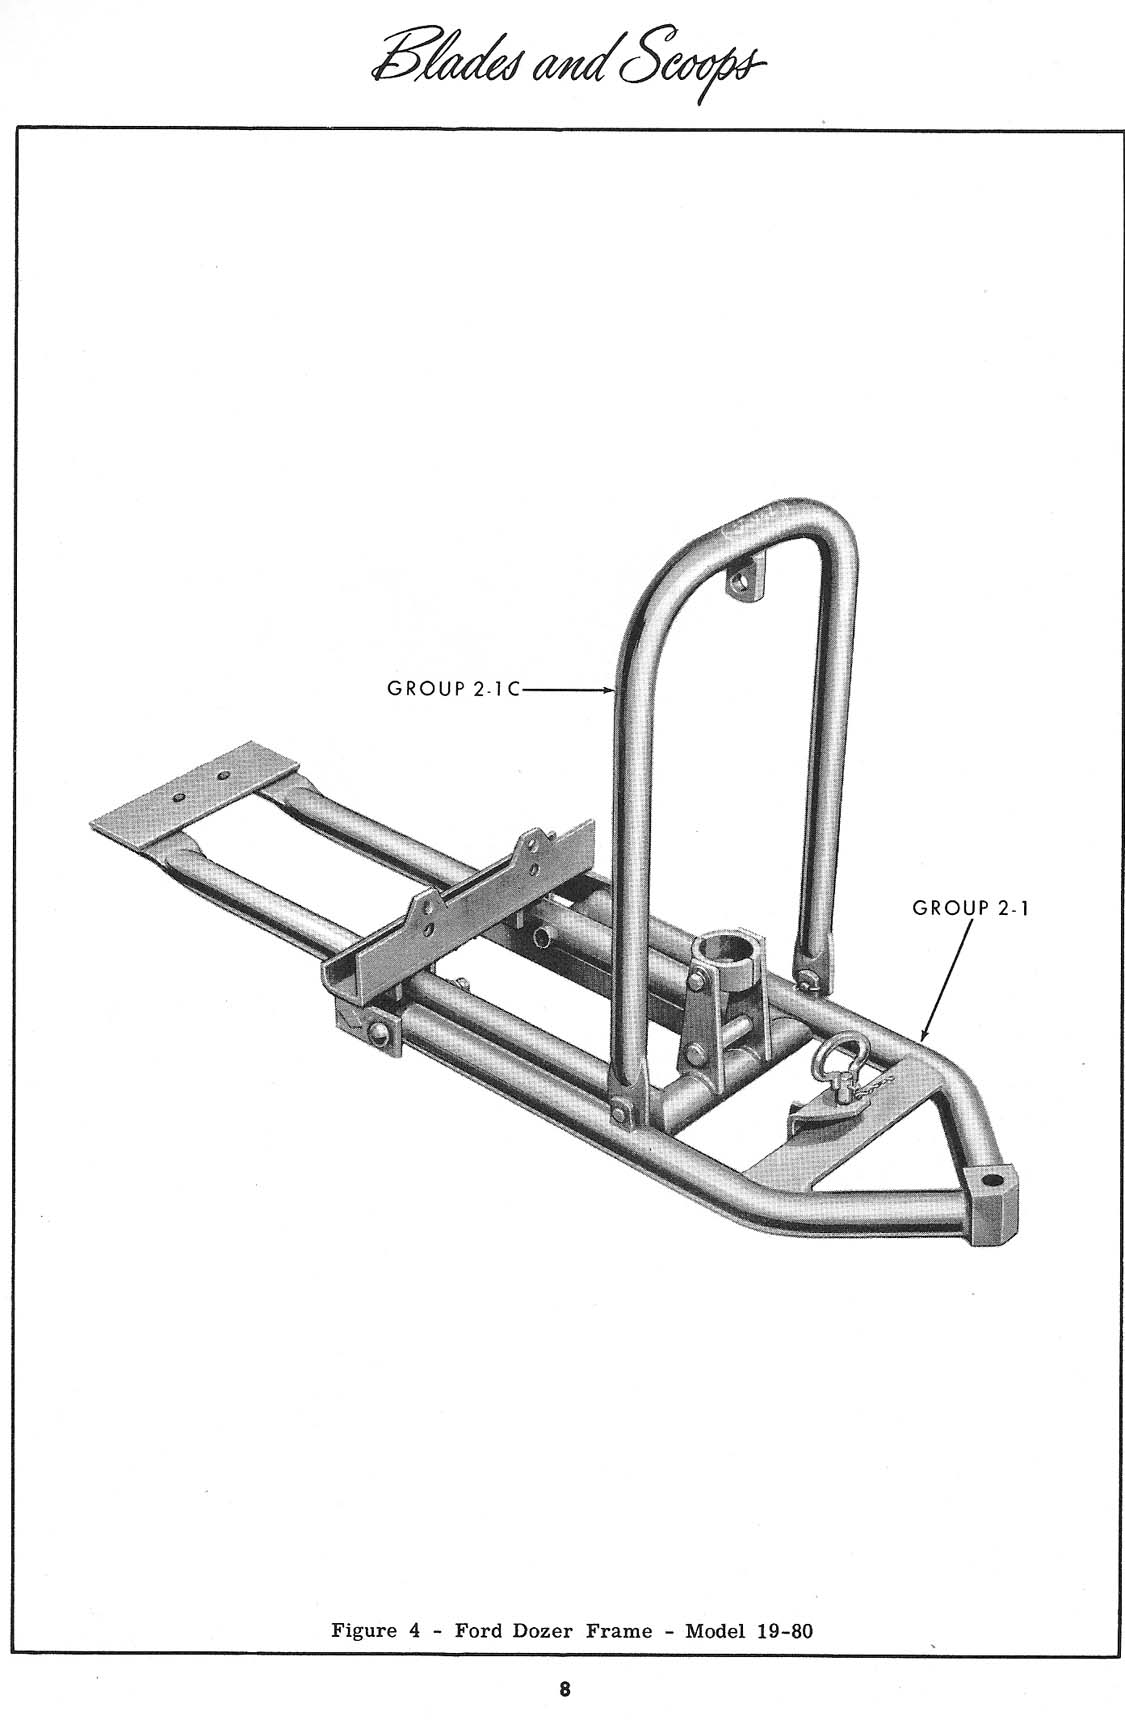 international wiring diagrams, altec bucket truck accessories, altec bucket  lift hydraulic schematic, altec